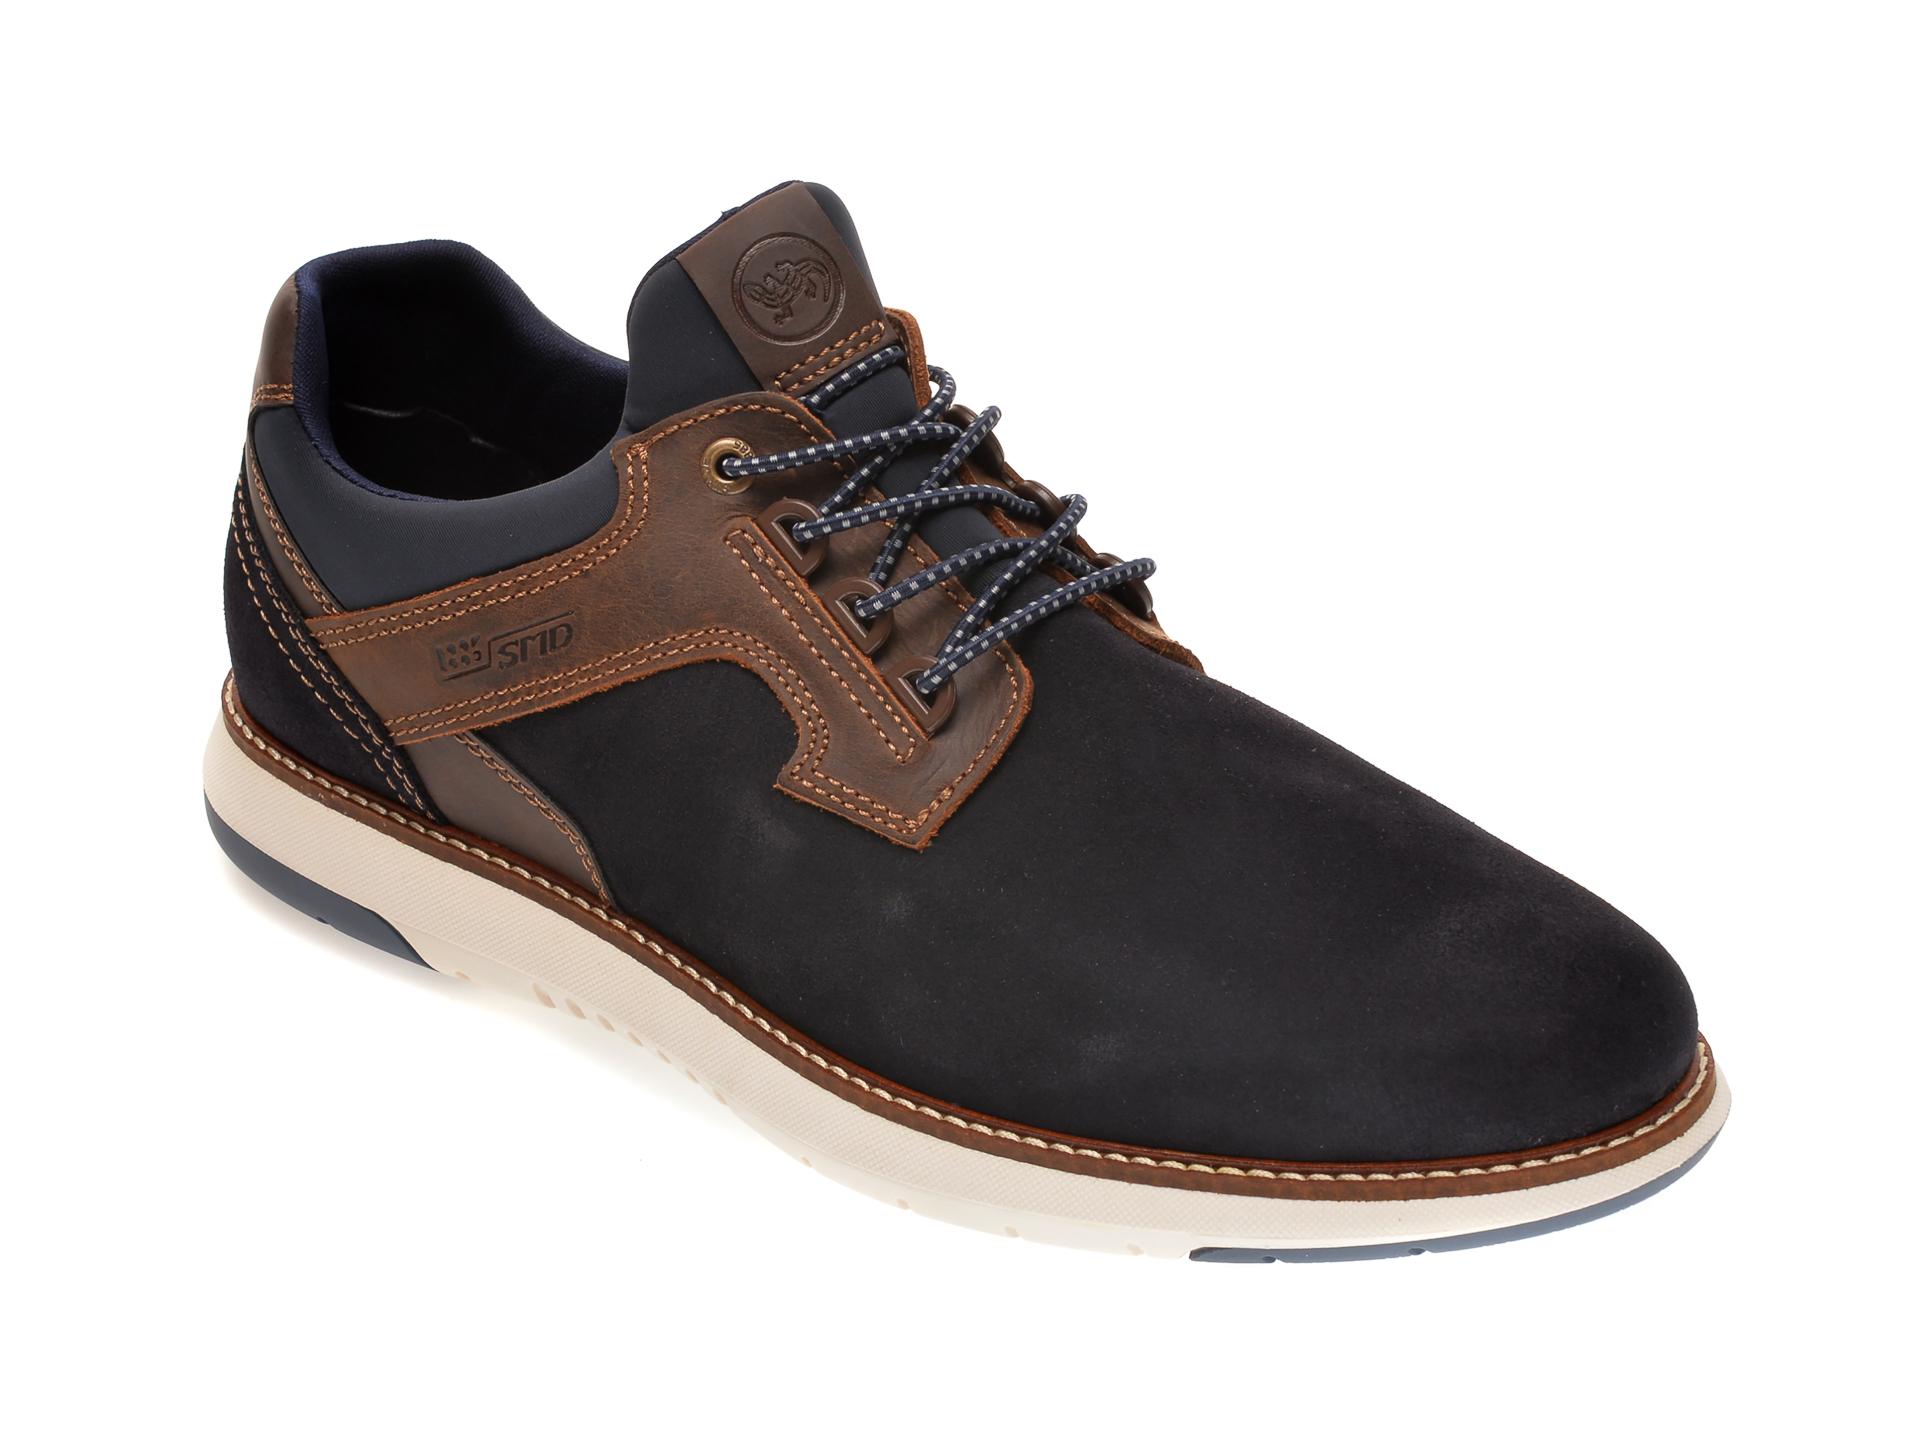 Pantofi SALAMANDER bleumarin, 60001, din piele intoarsa imagine